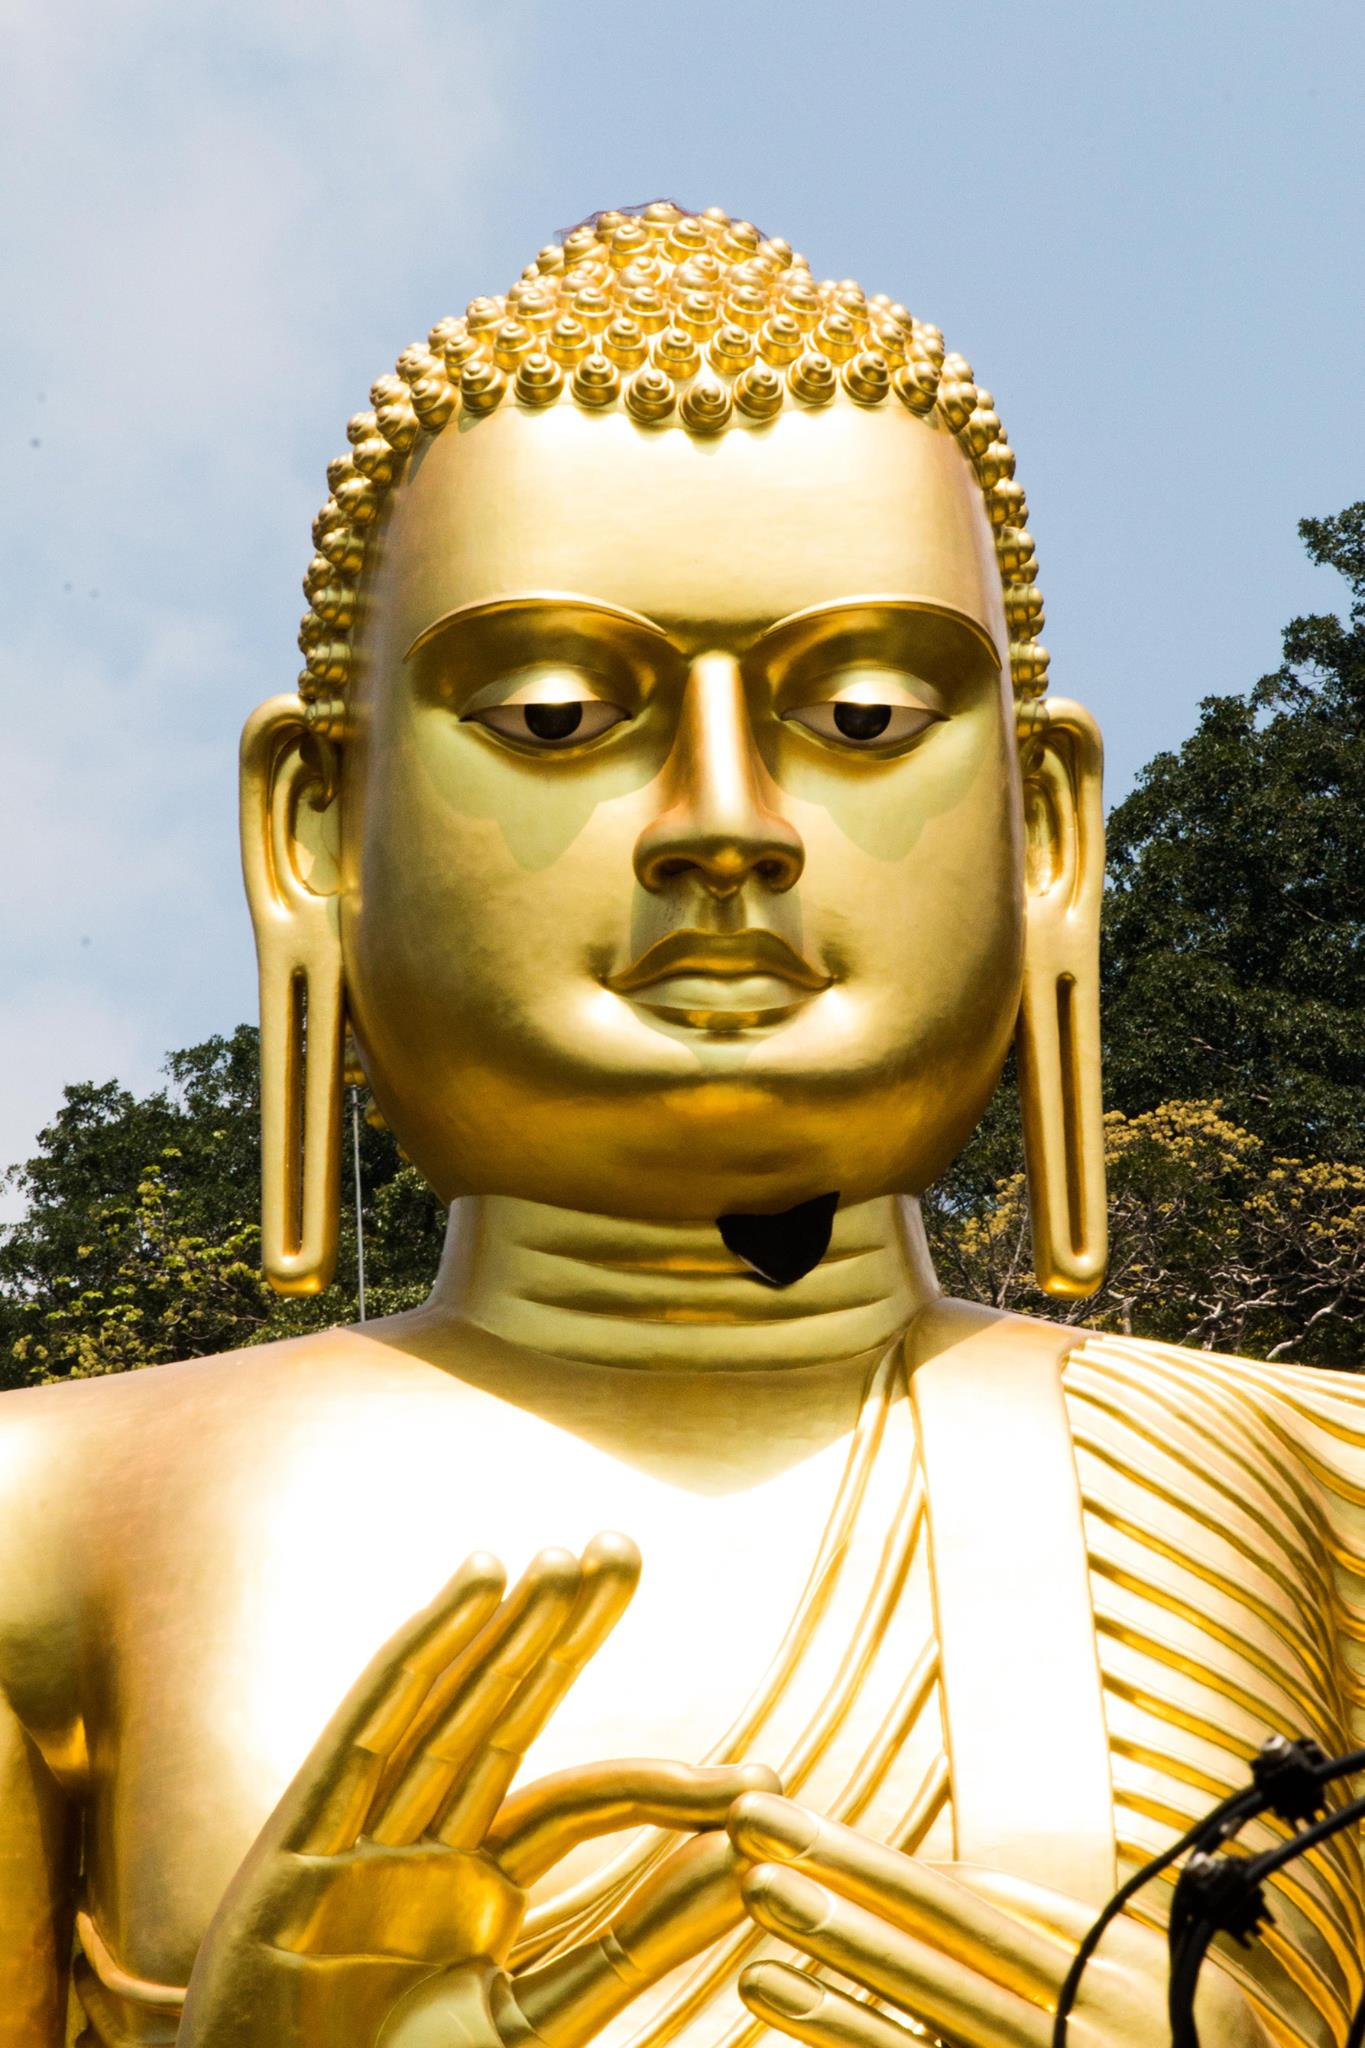 invite-to-paradise-sri-lanka-and-maldives-specialists-travel-agent-tour-operator-customer-review--feedback-joel-rhian-dambulla-cave-temple-2.jpg